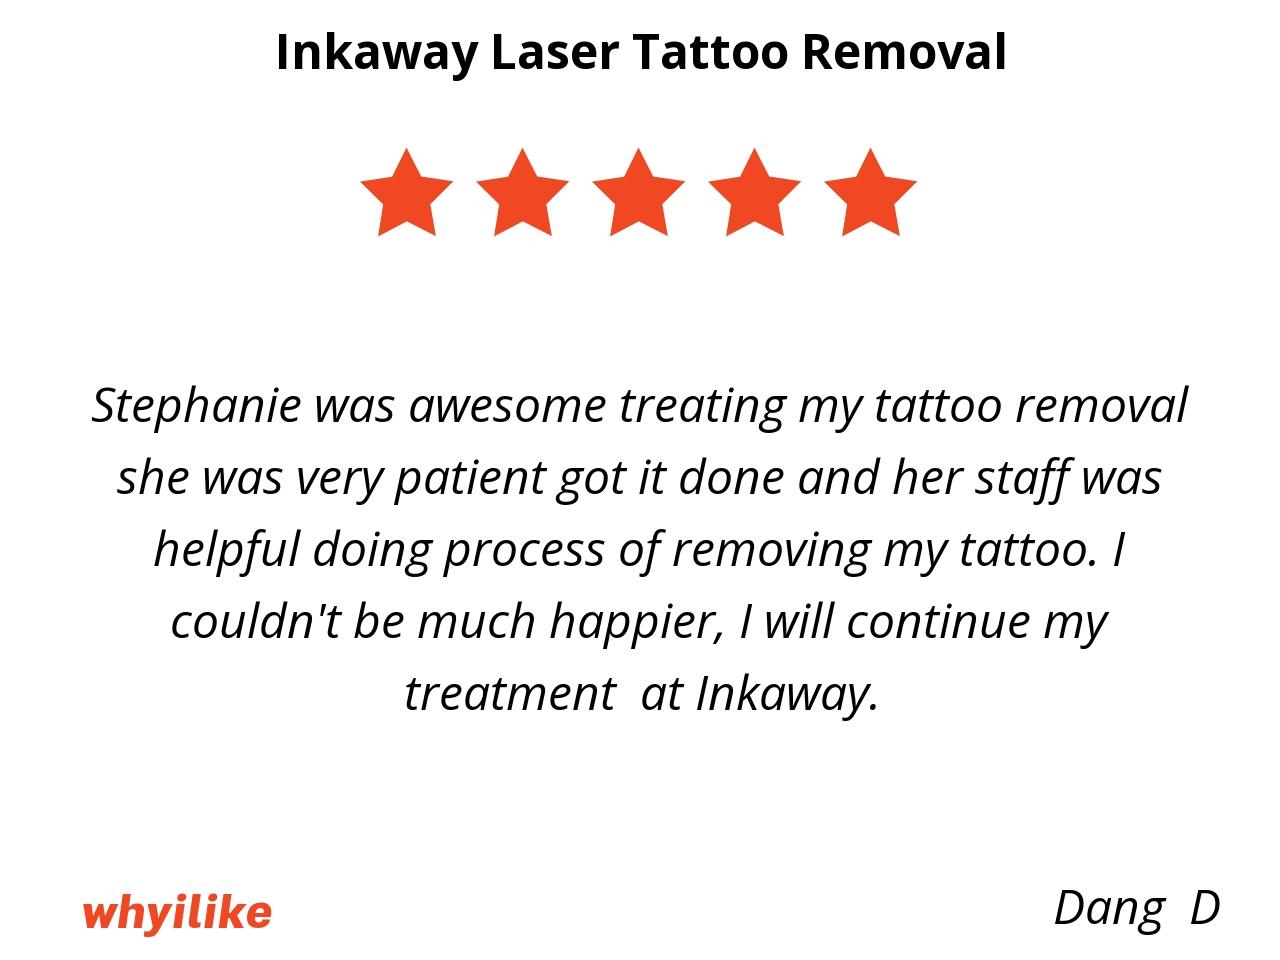 Why I like Inkaway Laser Tattoo Removal